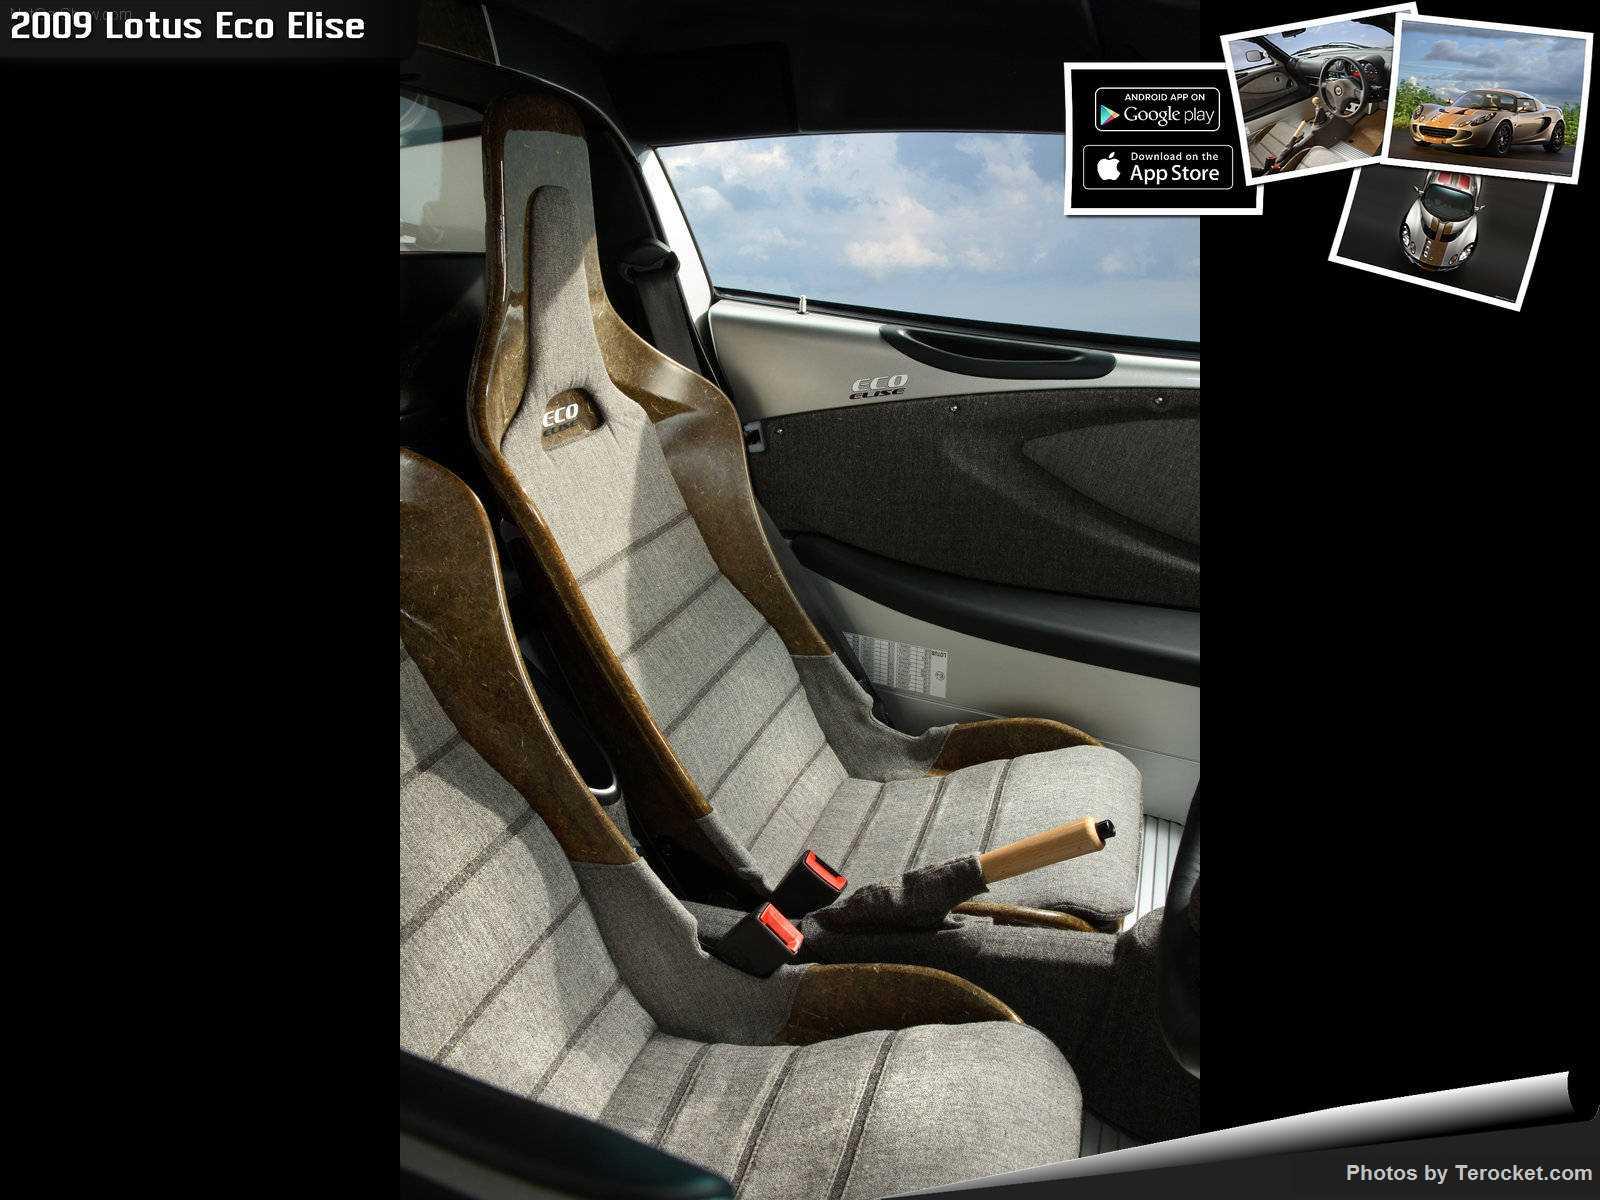 Hình ảnh siêu xe Lotus Eco Elise 2009 & nội ngoại thất